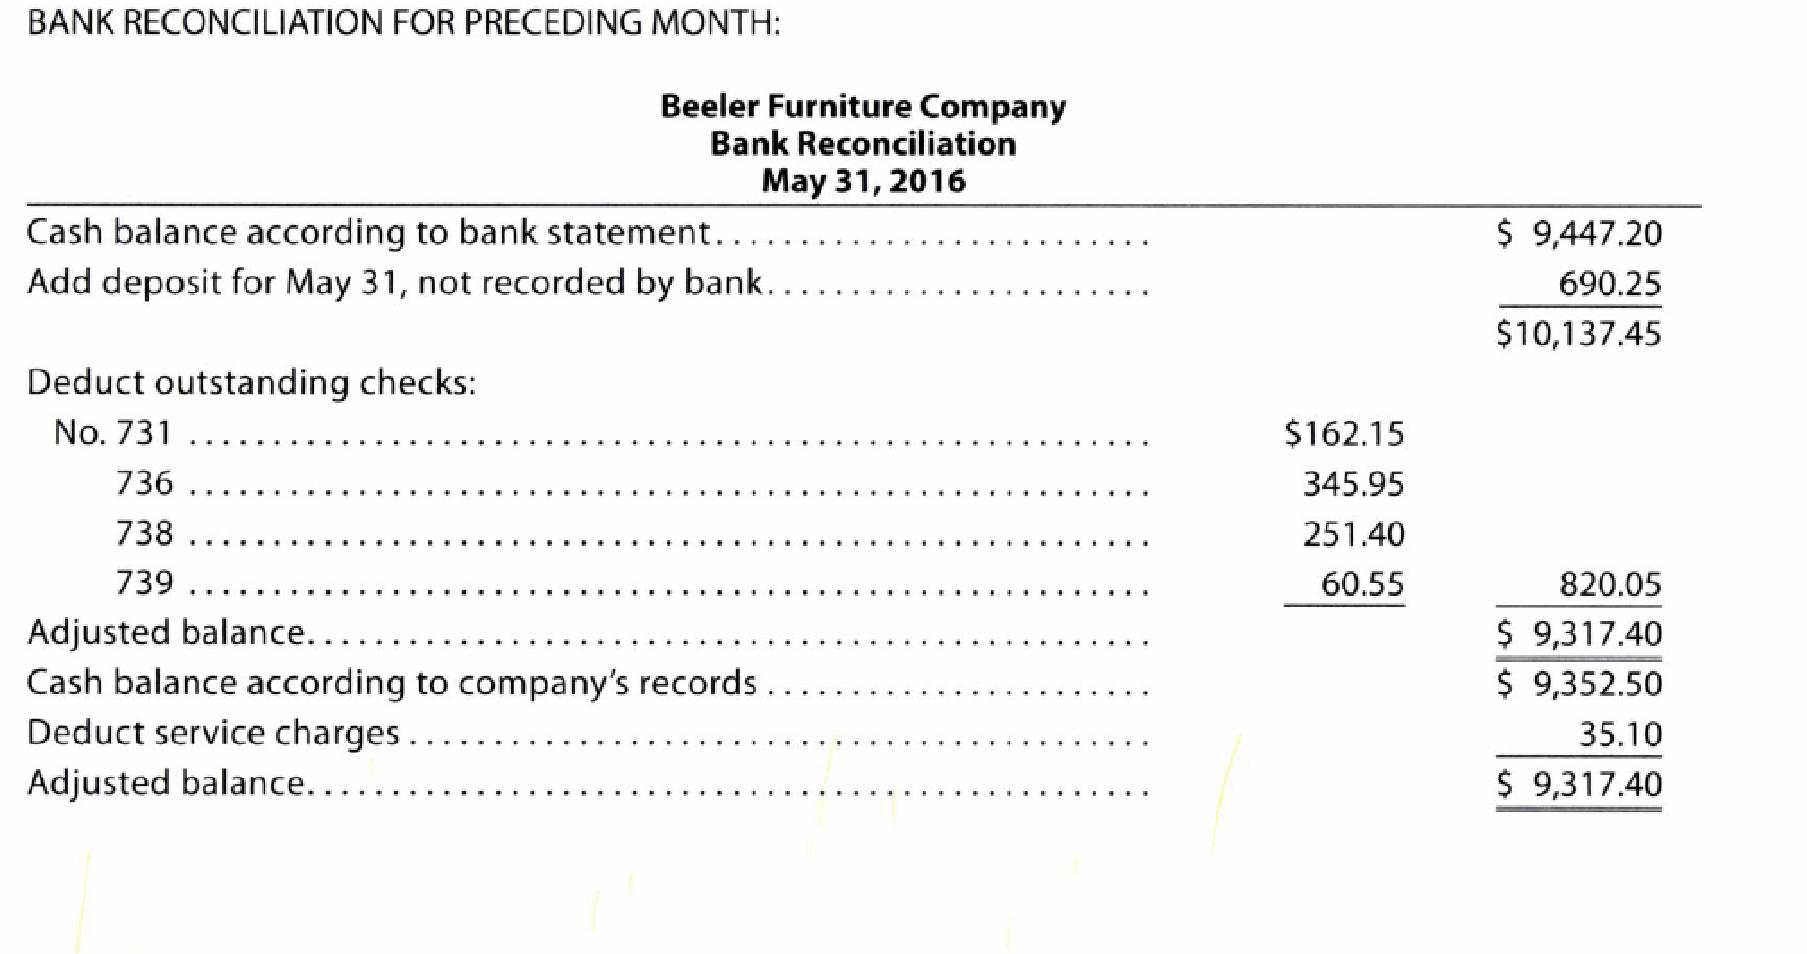 Beeler Furniture Company Deposits All Cash Receipts Each